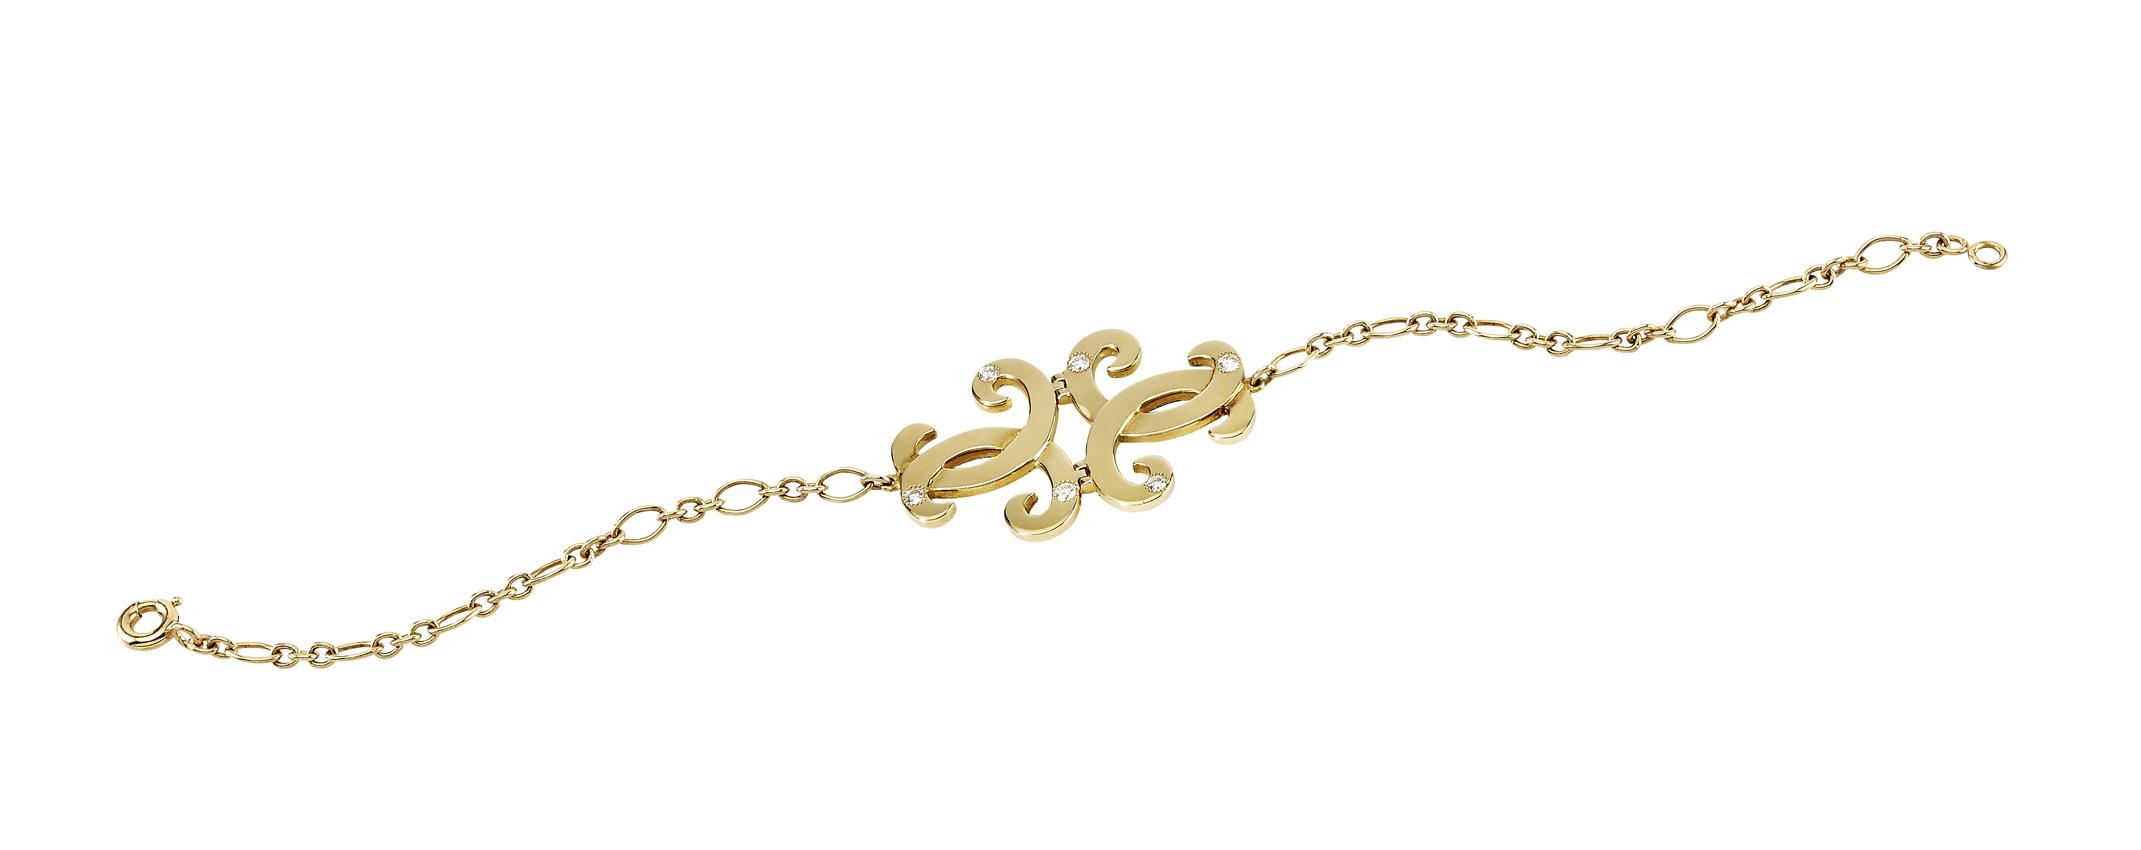 HEDONE ROMANE Rusalka bracelet